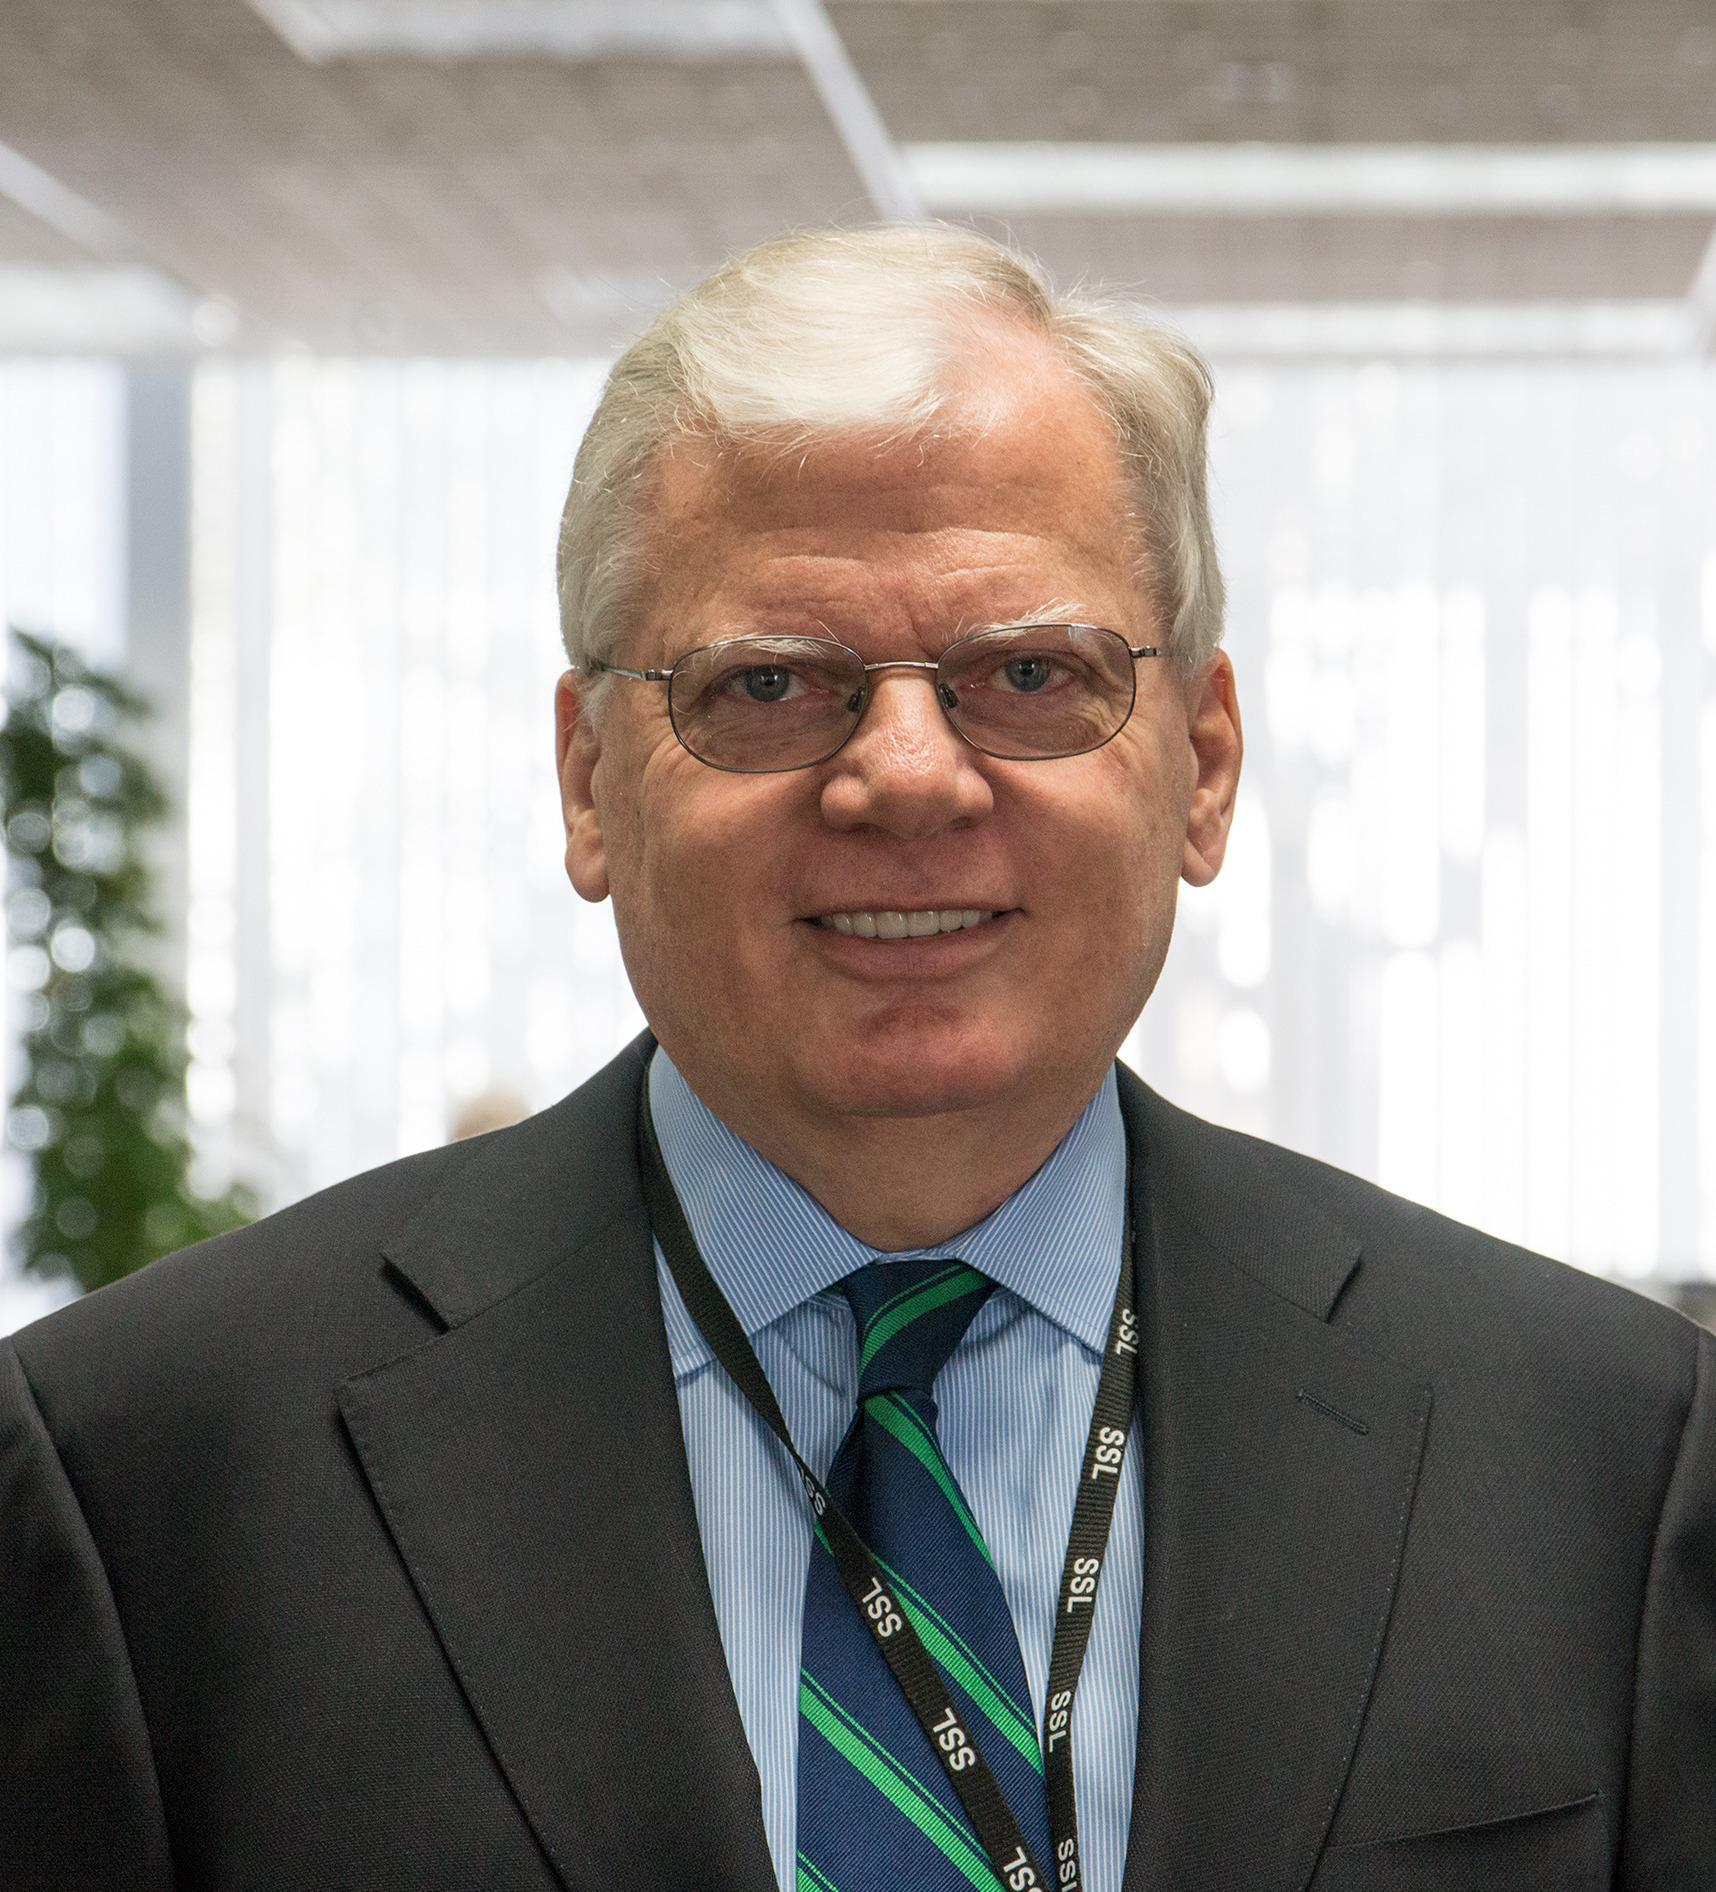 John Celli, president i Space Systems Loral. Foto: Jørgen Elton Nilsen, Tek.no